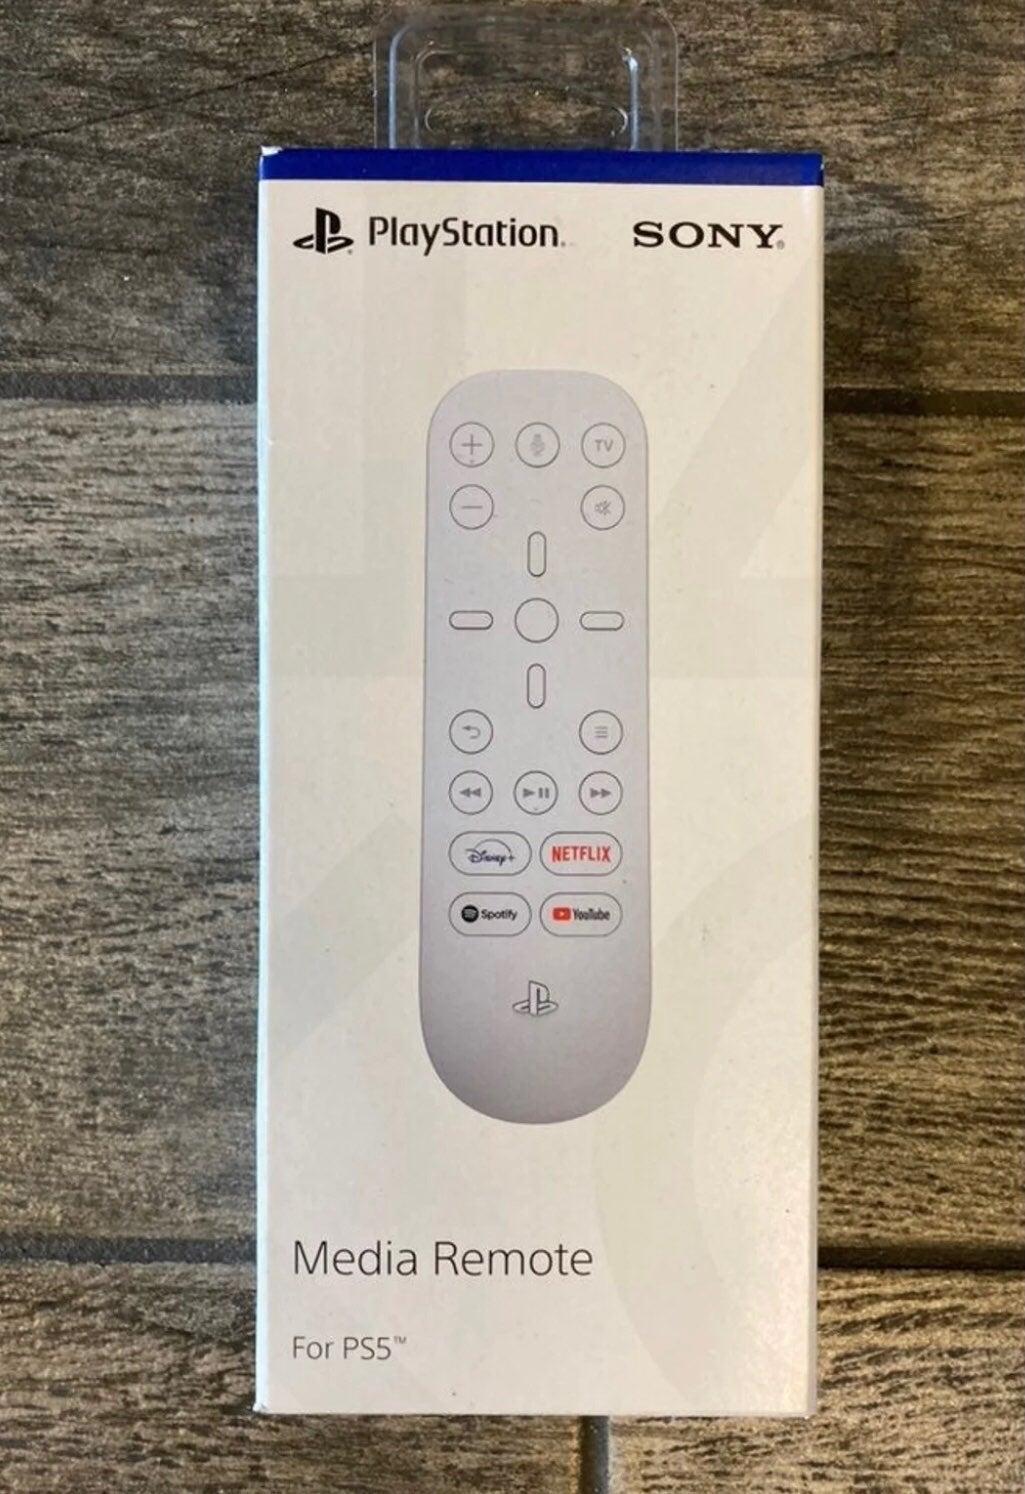 PS5 Media Remote Sony Playstation 5